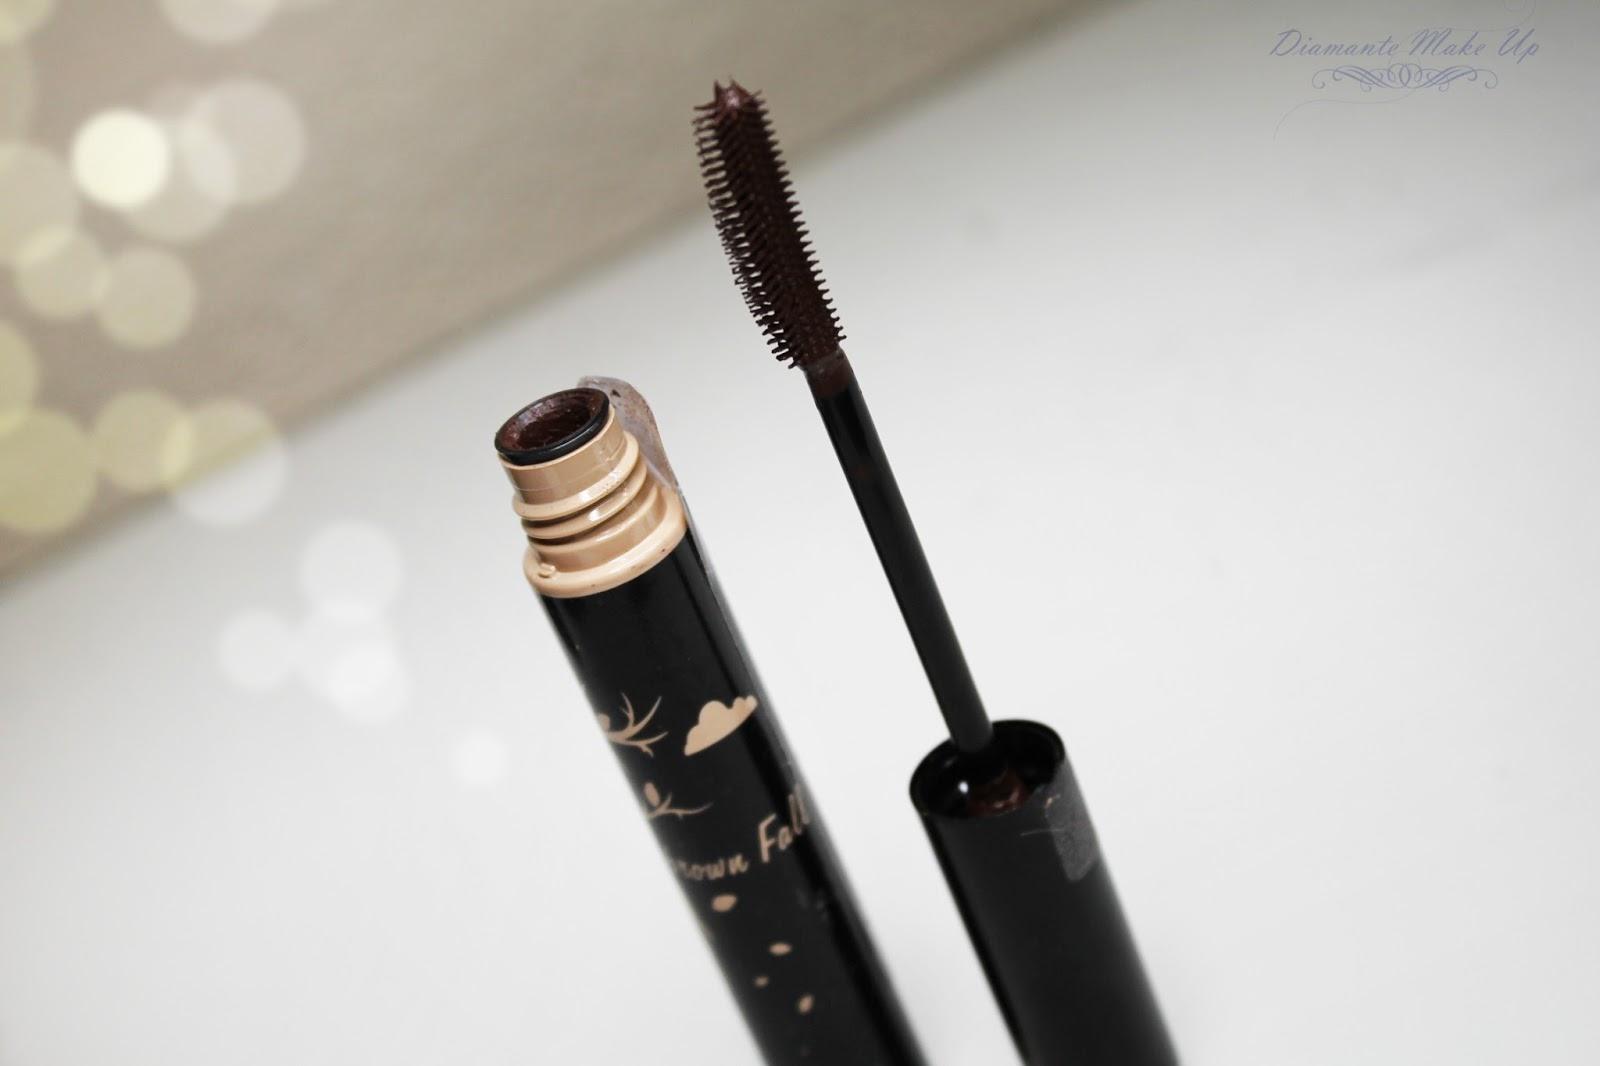 Brazowa Maskara Vipera Cosmetics - Recenzja